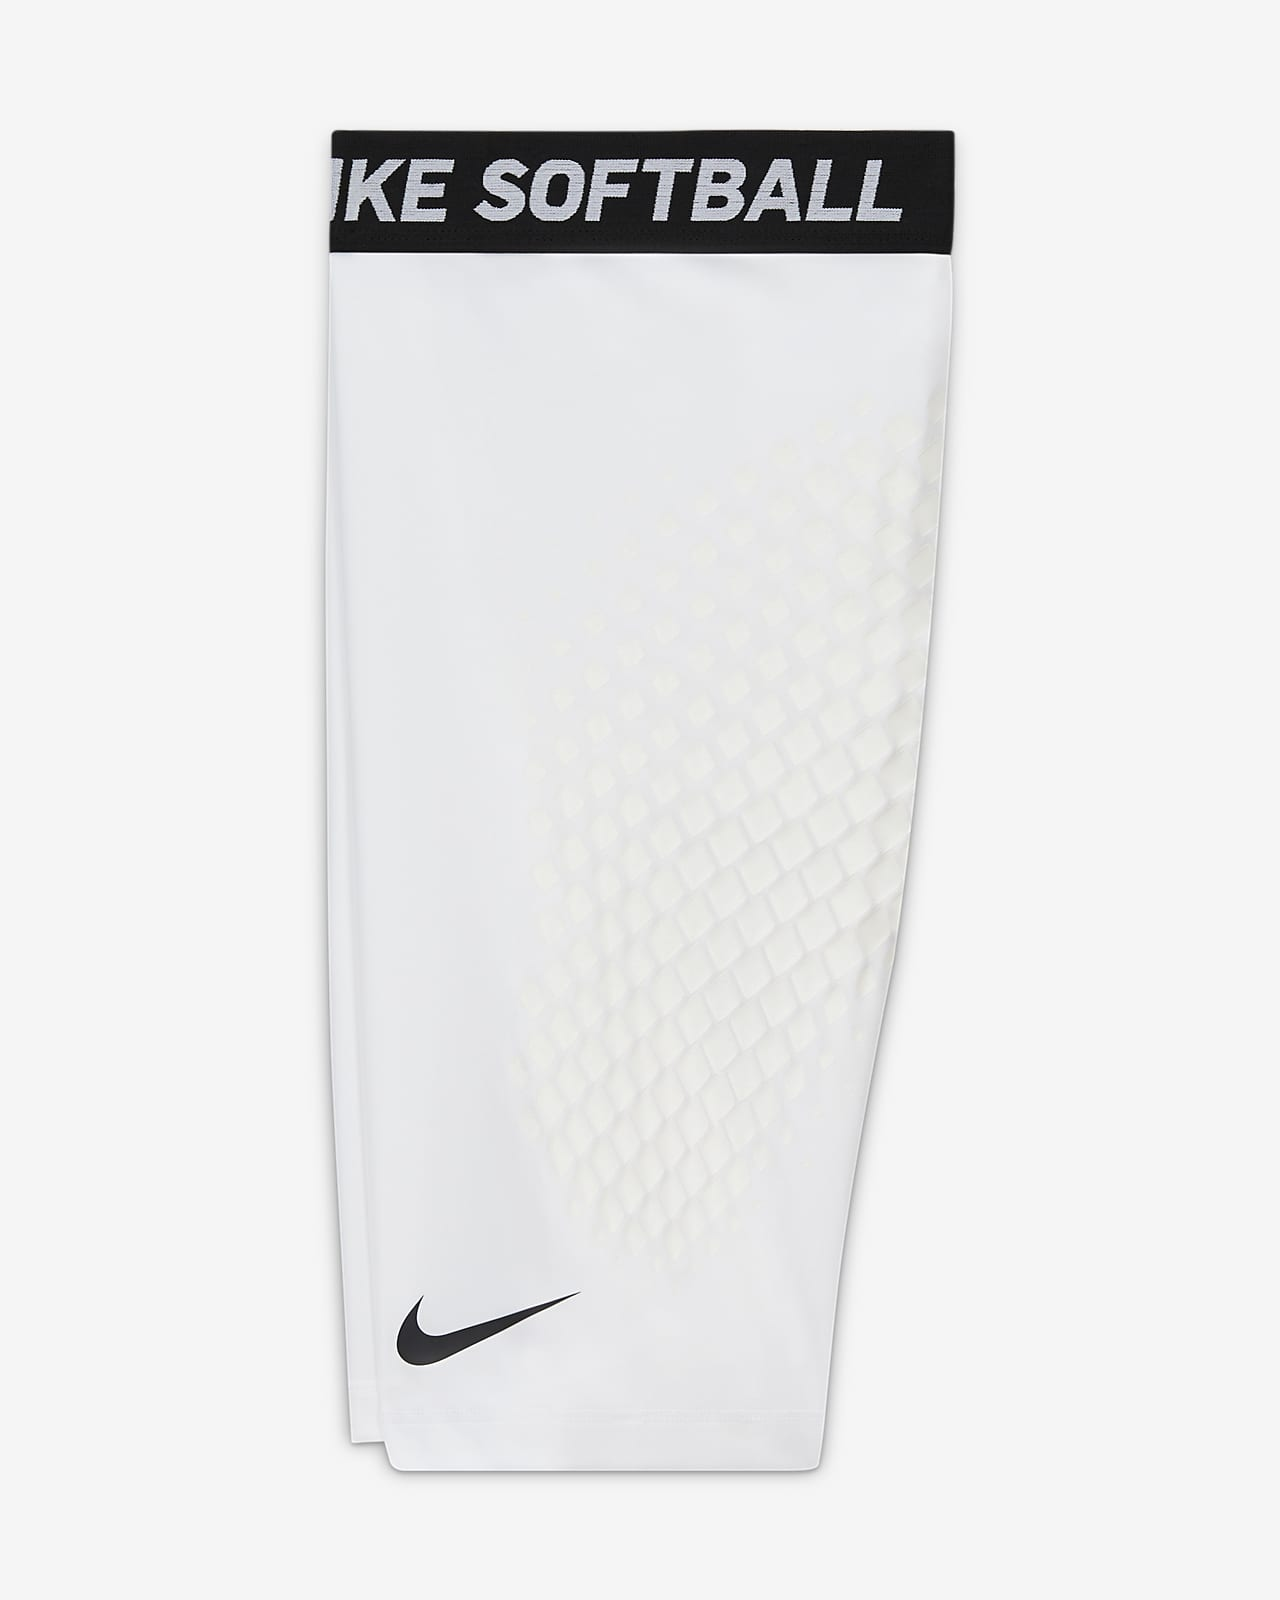 Nike Dri-FIT Women's Slider Softball Shorts